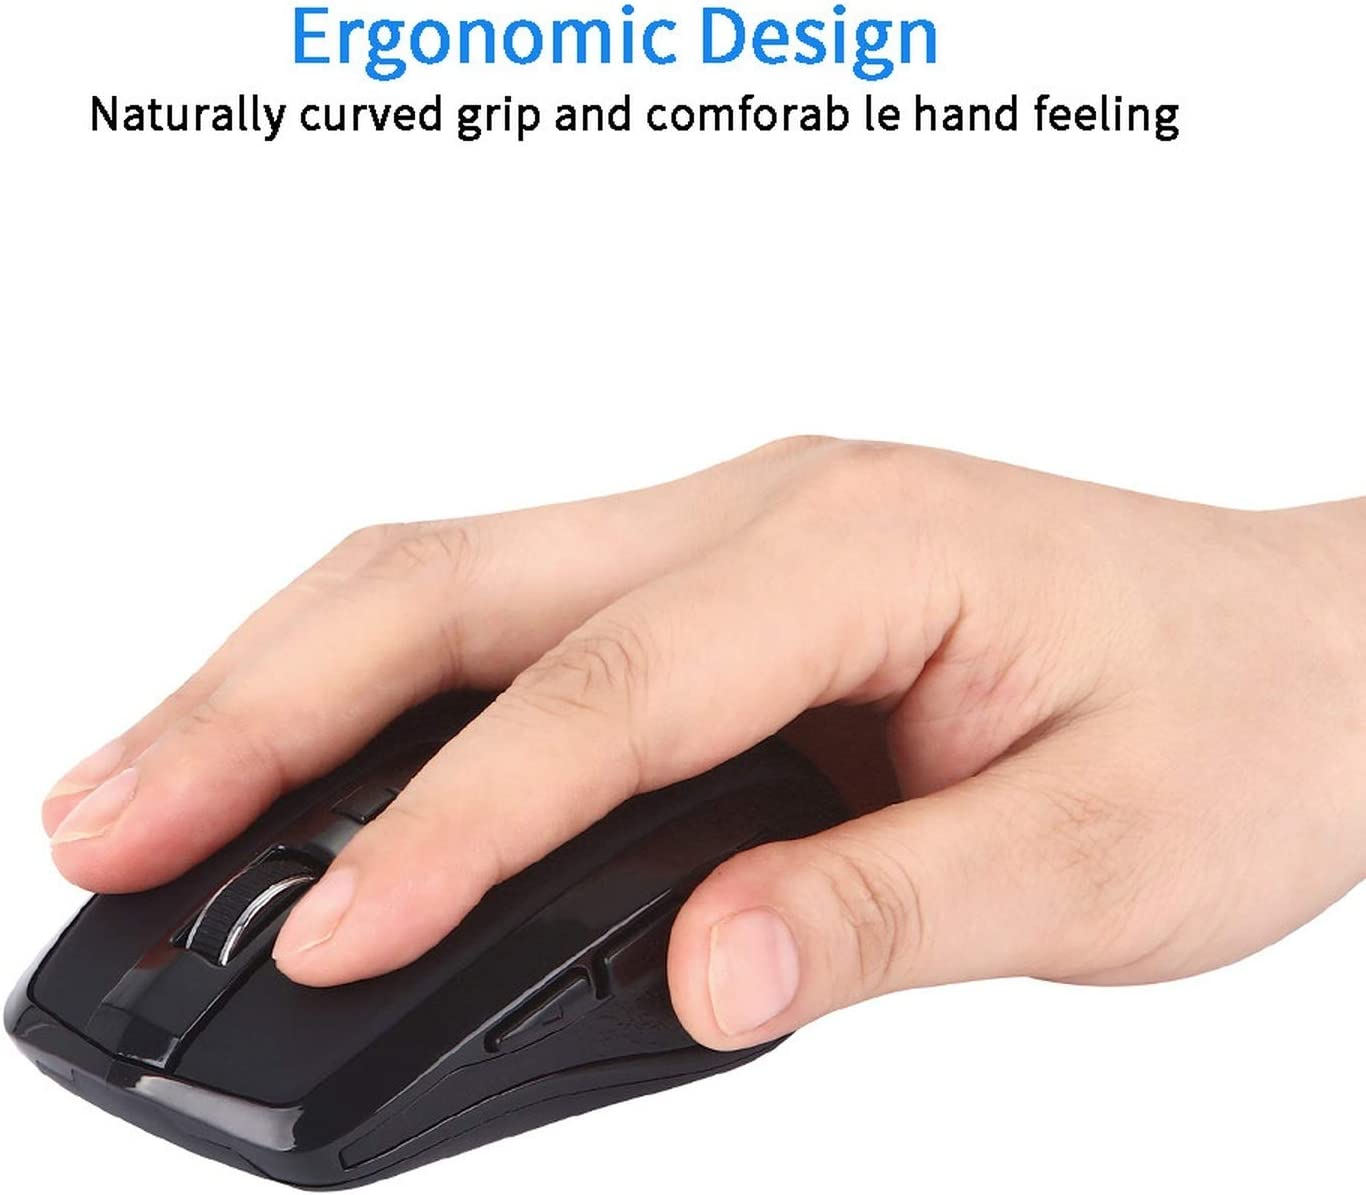 2.4GHZ Type C Wireless Mouse USB C Mice for MacBook//Pro USB C Devices Mini Mice USB Receiver for Laptop PC Desktop,